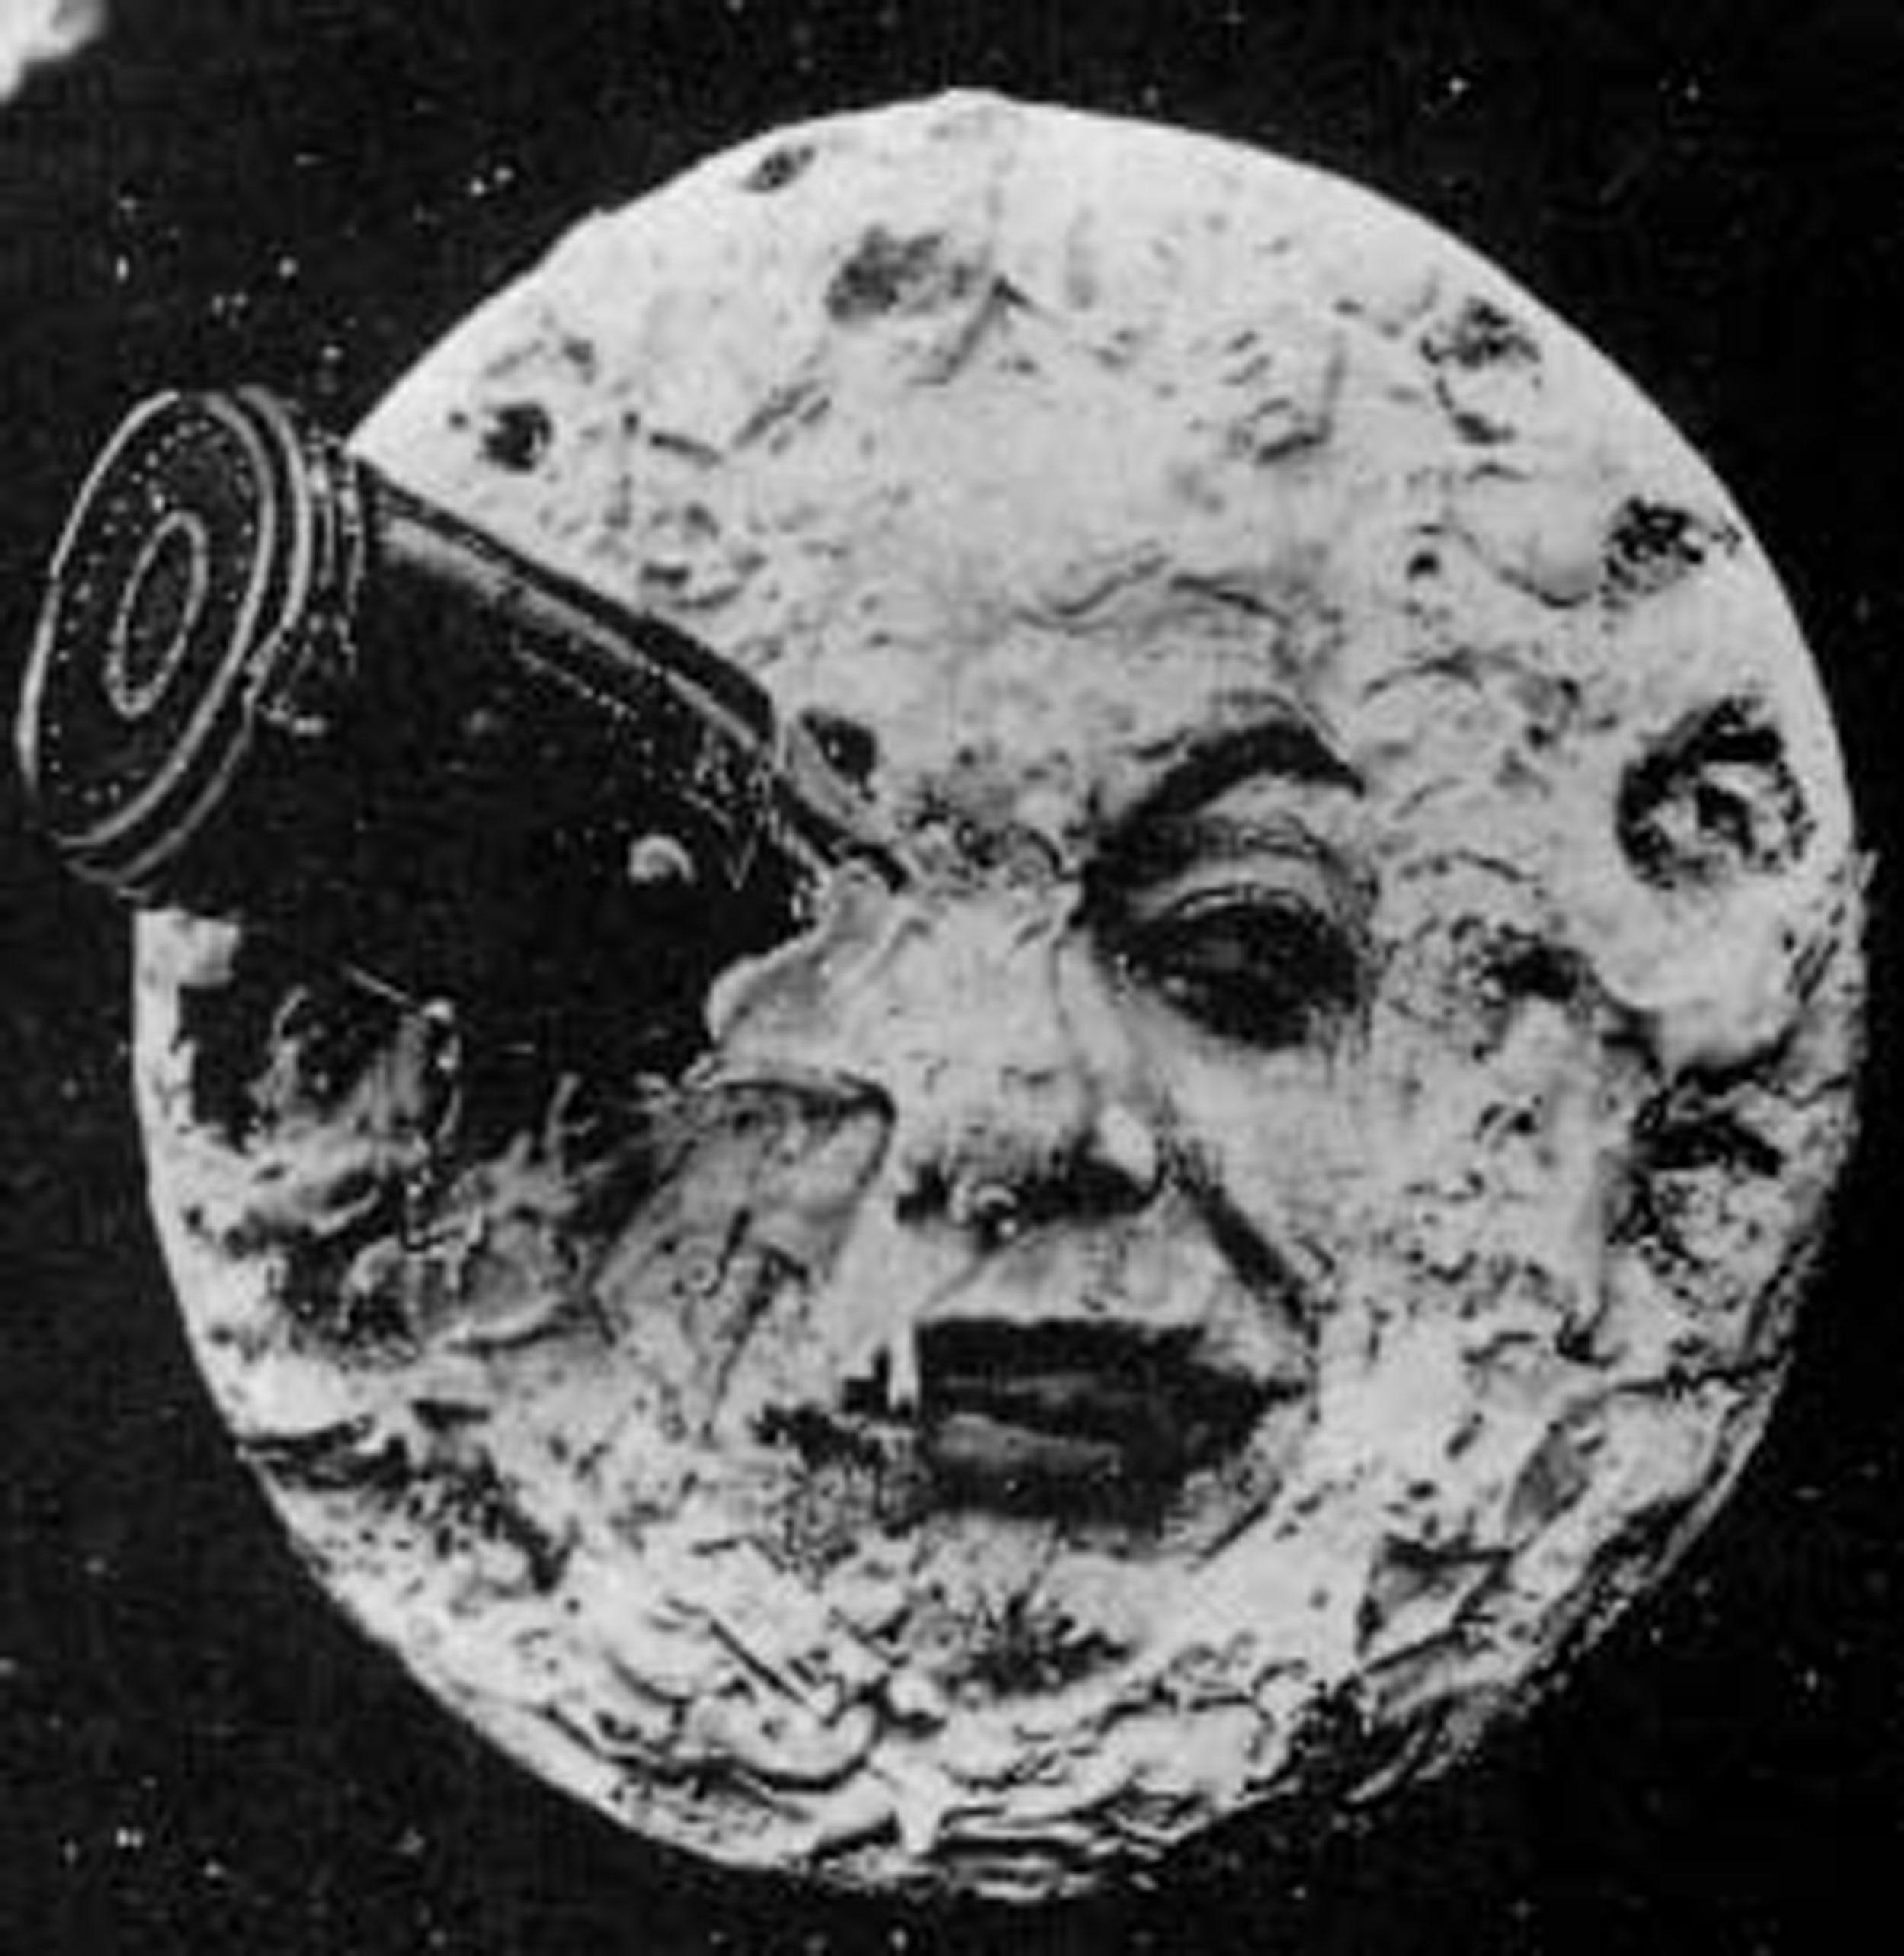 Image : Georges Méliès  Trip to the Moon 1902